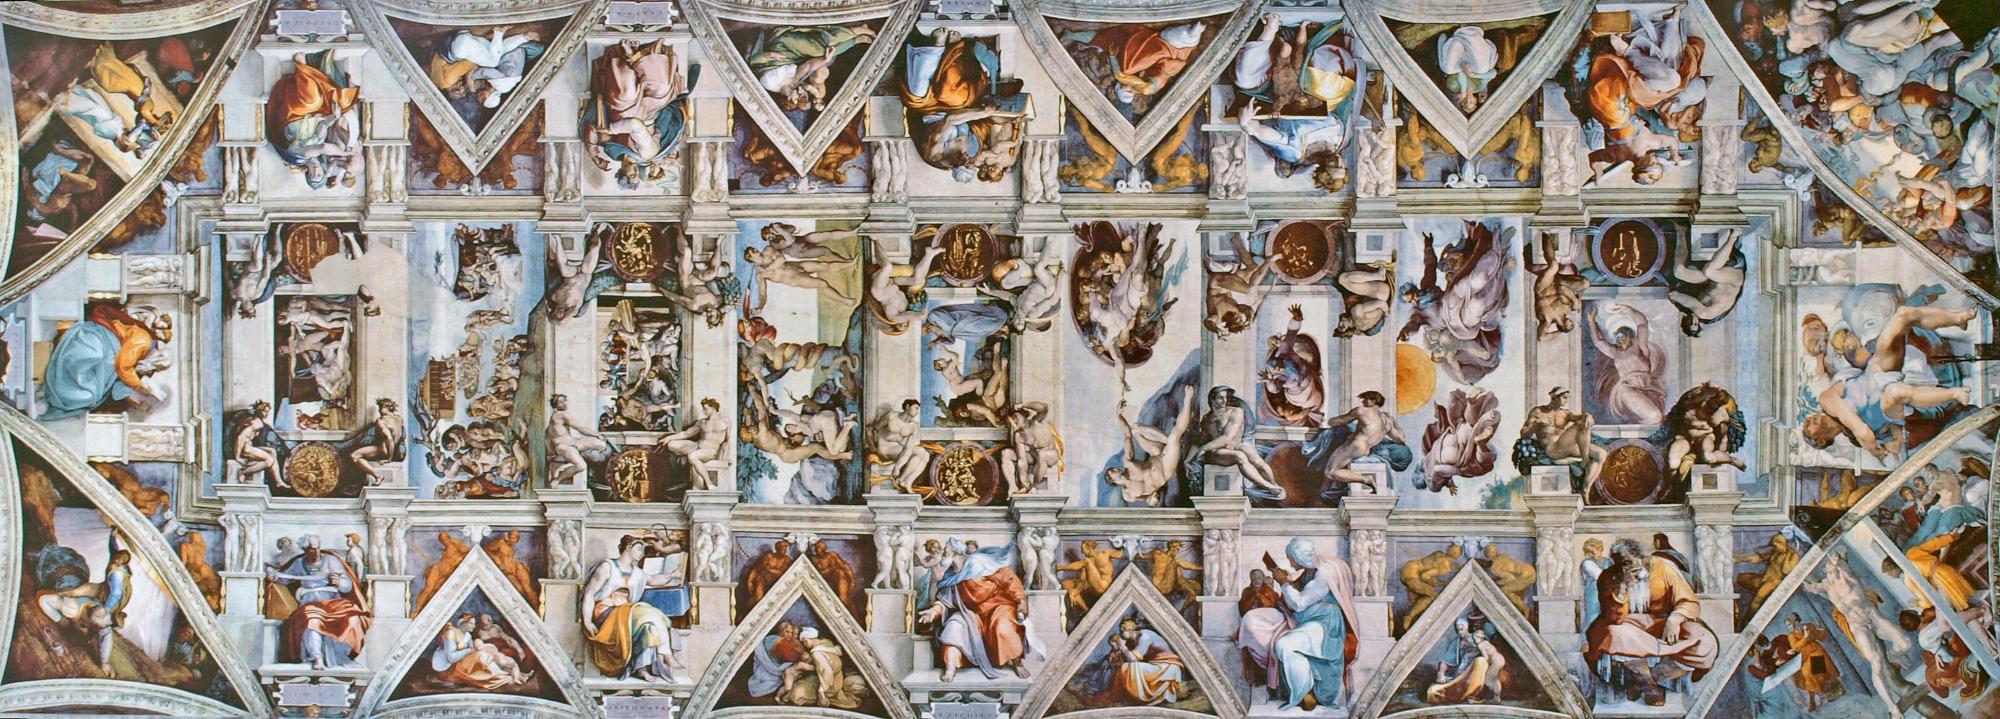 Sistine Chapel Ceiling)